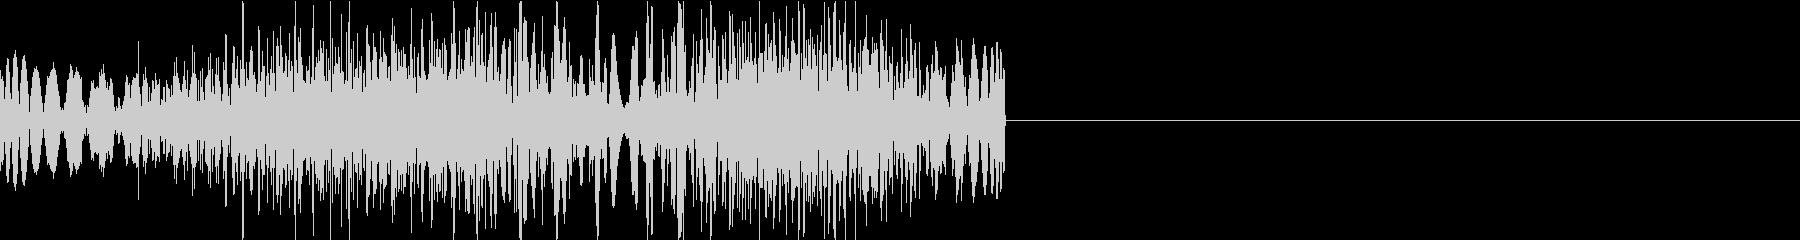 DJプレイ スクラッチ・ノイズ 314の未再生の波形